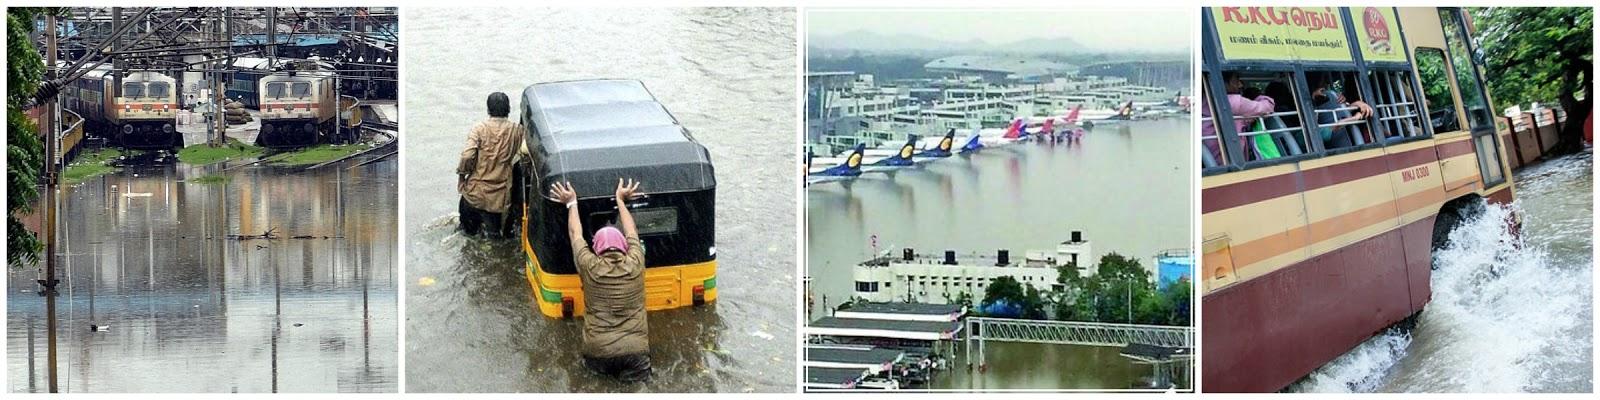 Help Chennai floods